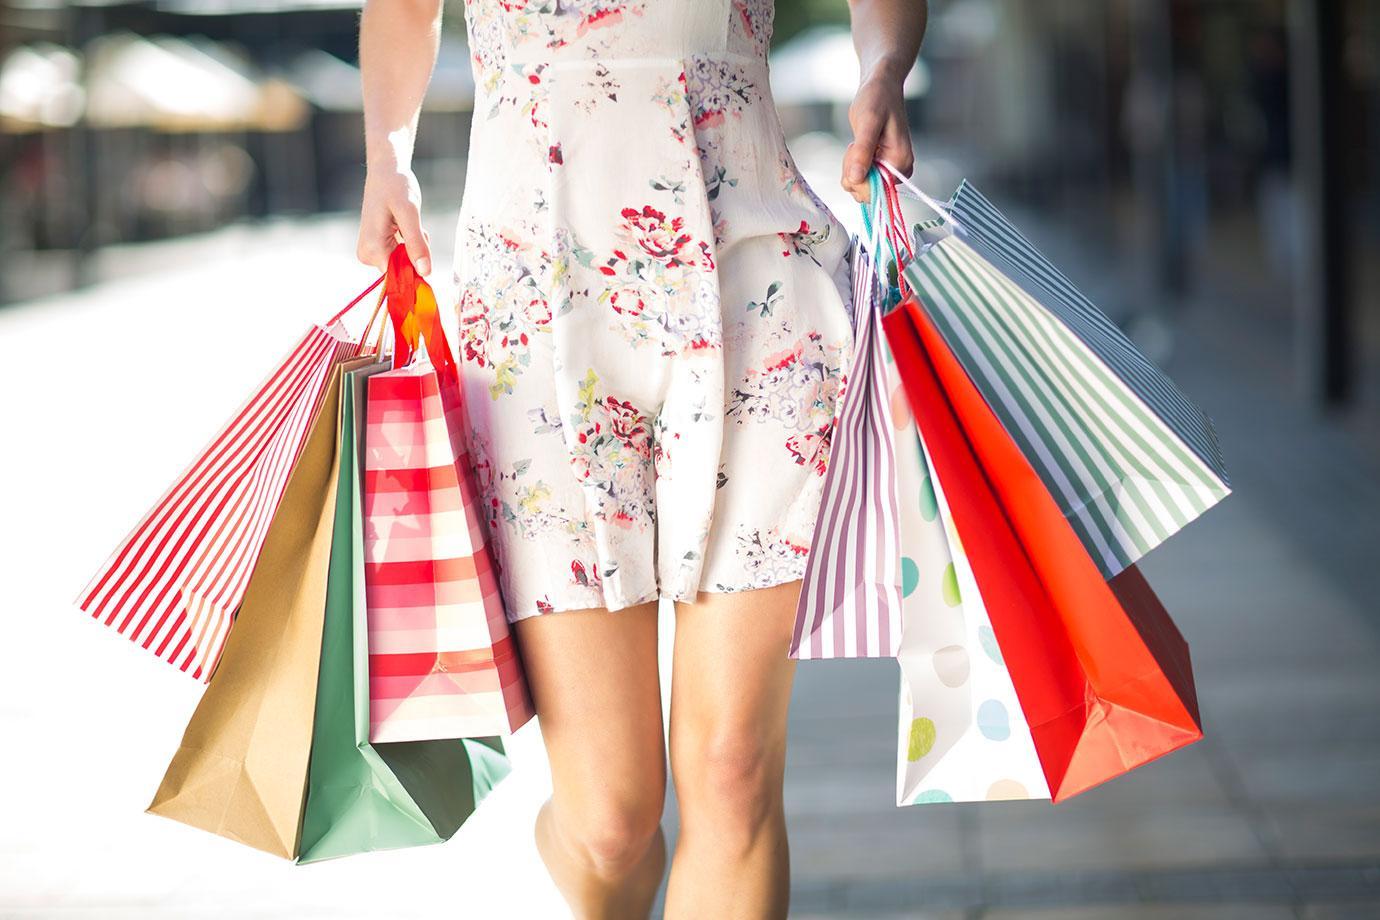 Woman on Shopping Spree